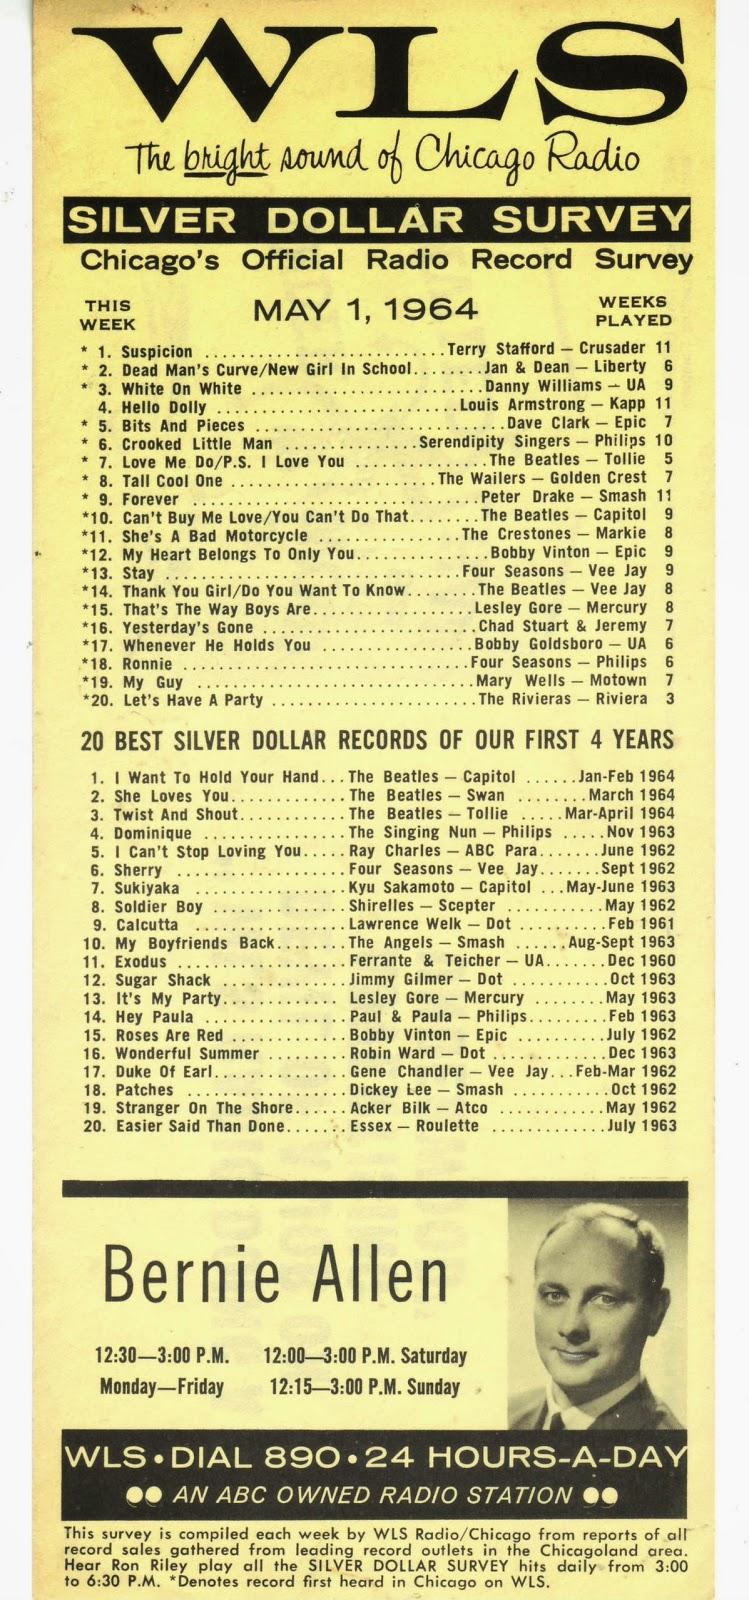 classic top 40 radio wls chicago silver dollar survey 5 1 64 bernie